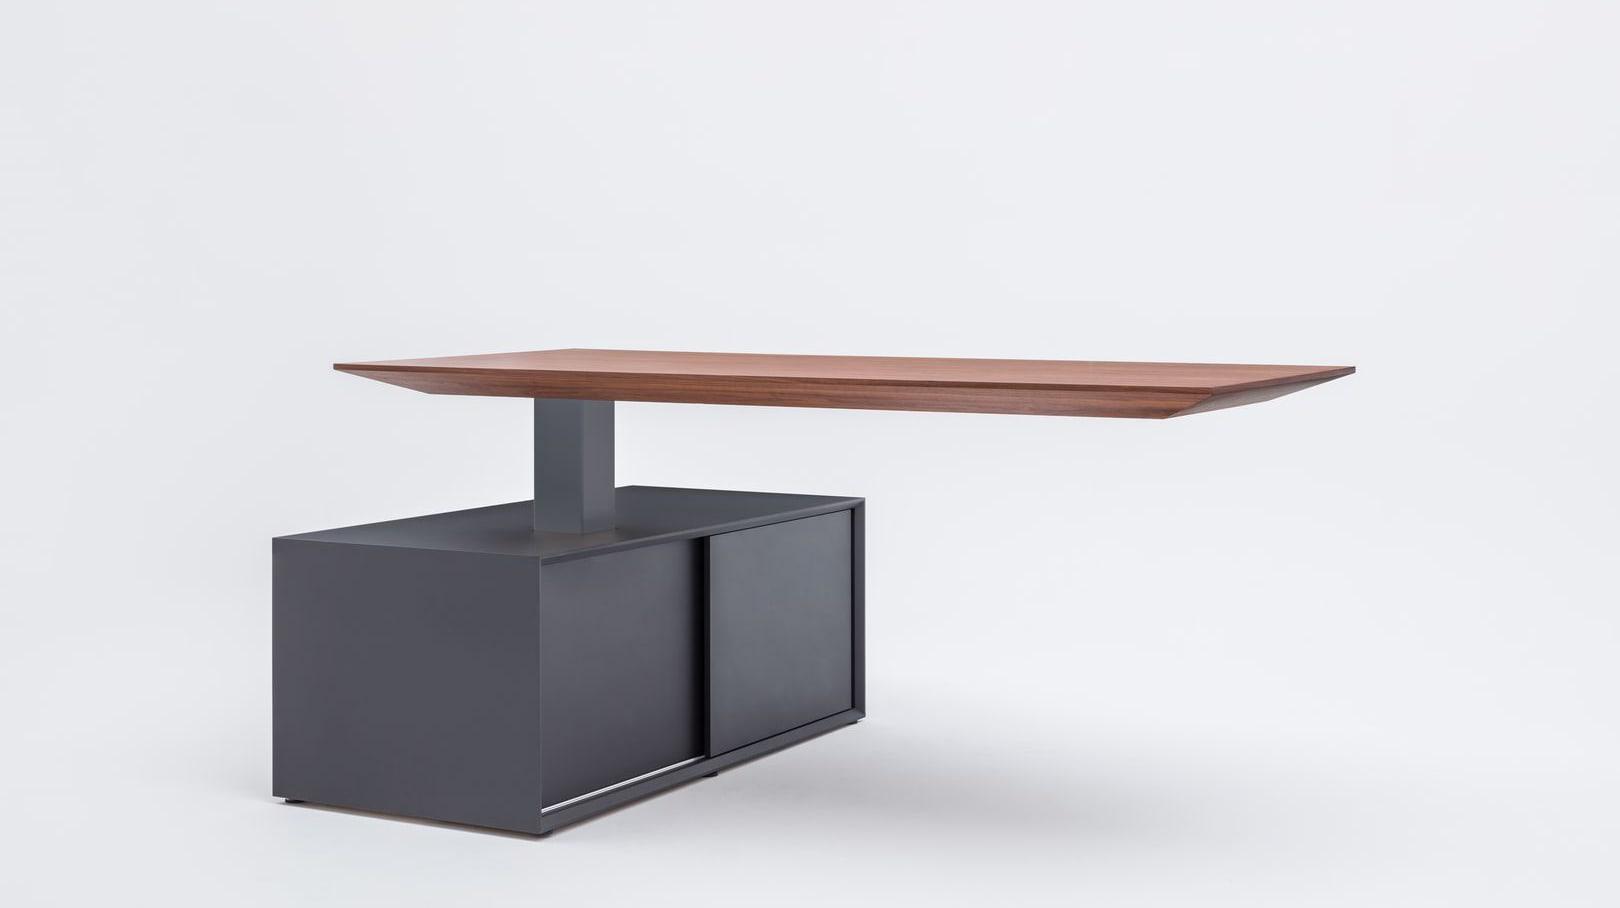 Lewitujące biurko Gravity